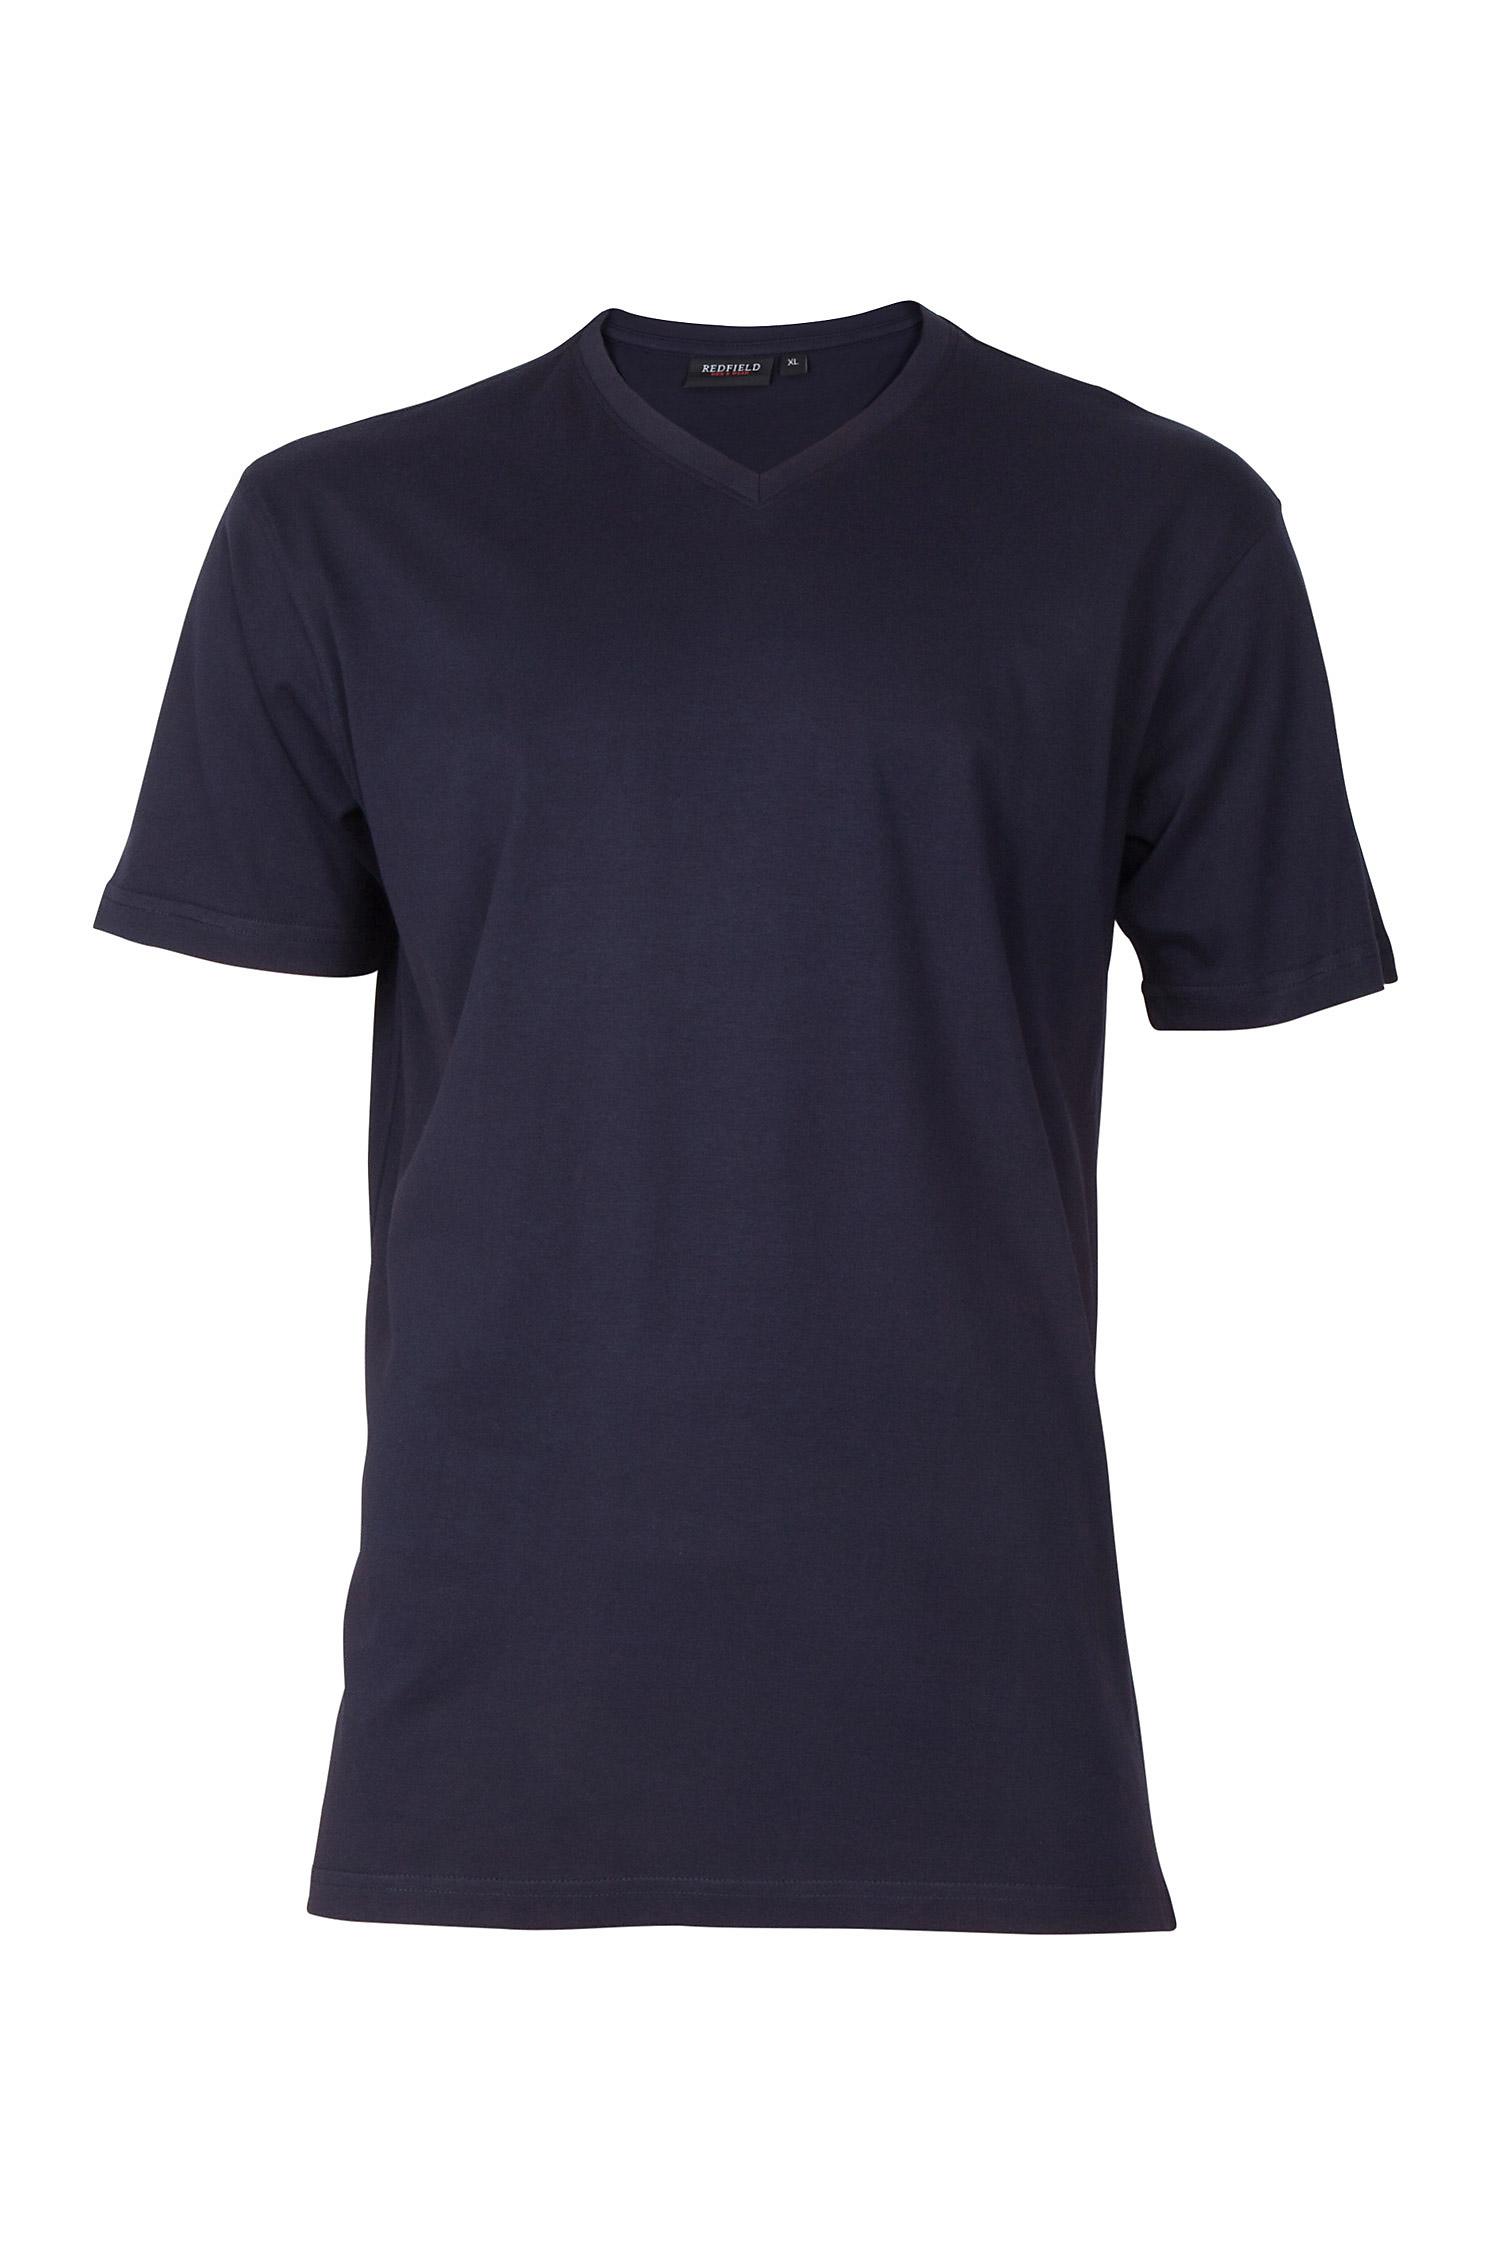 Sport, Camisetas M. Corta, 109110, MARINO   Zoom